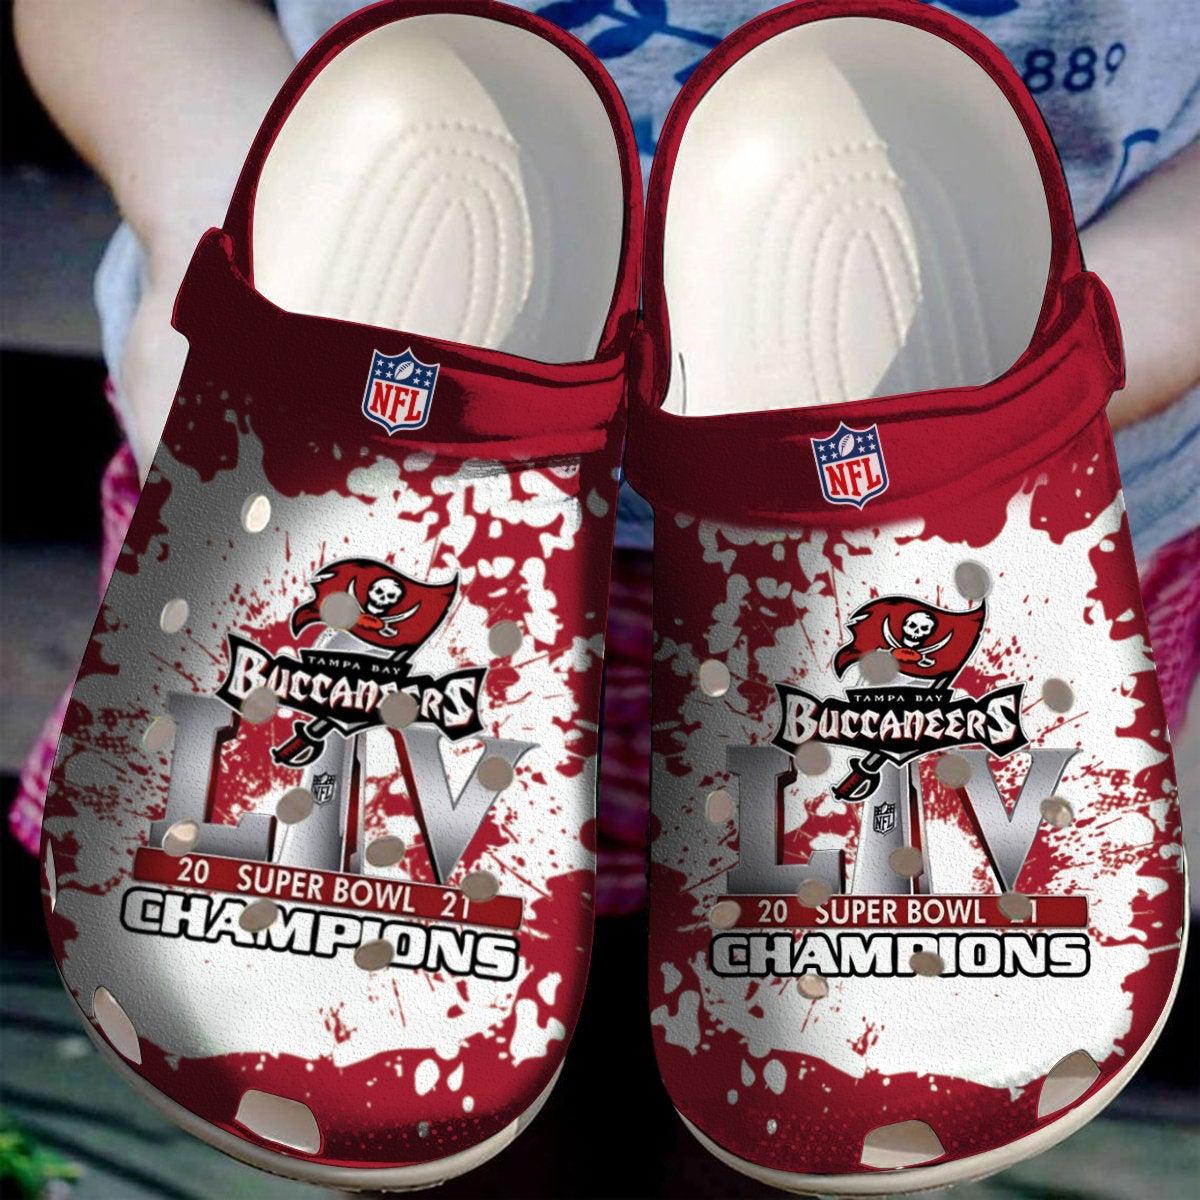 Tampa Bay Buccaneers Champions Nfl Crocs Clog Shoes